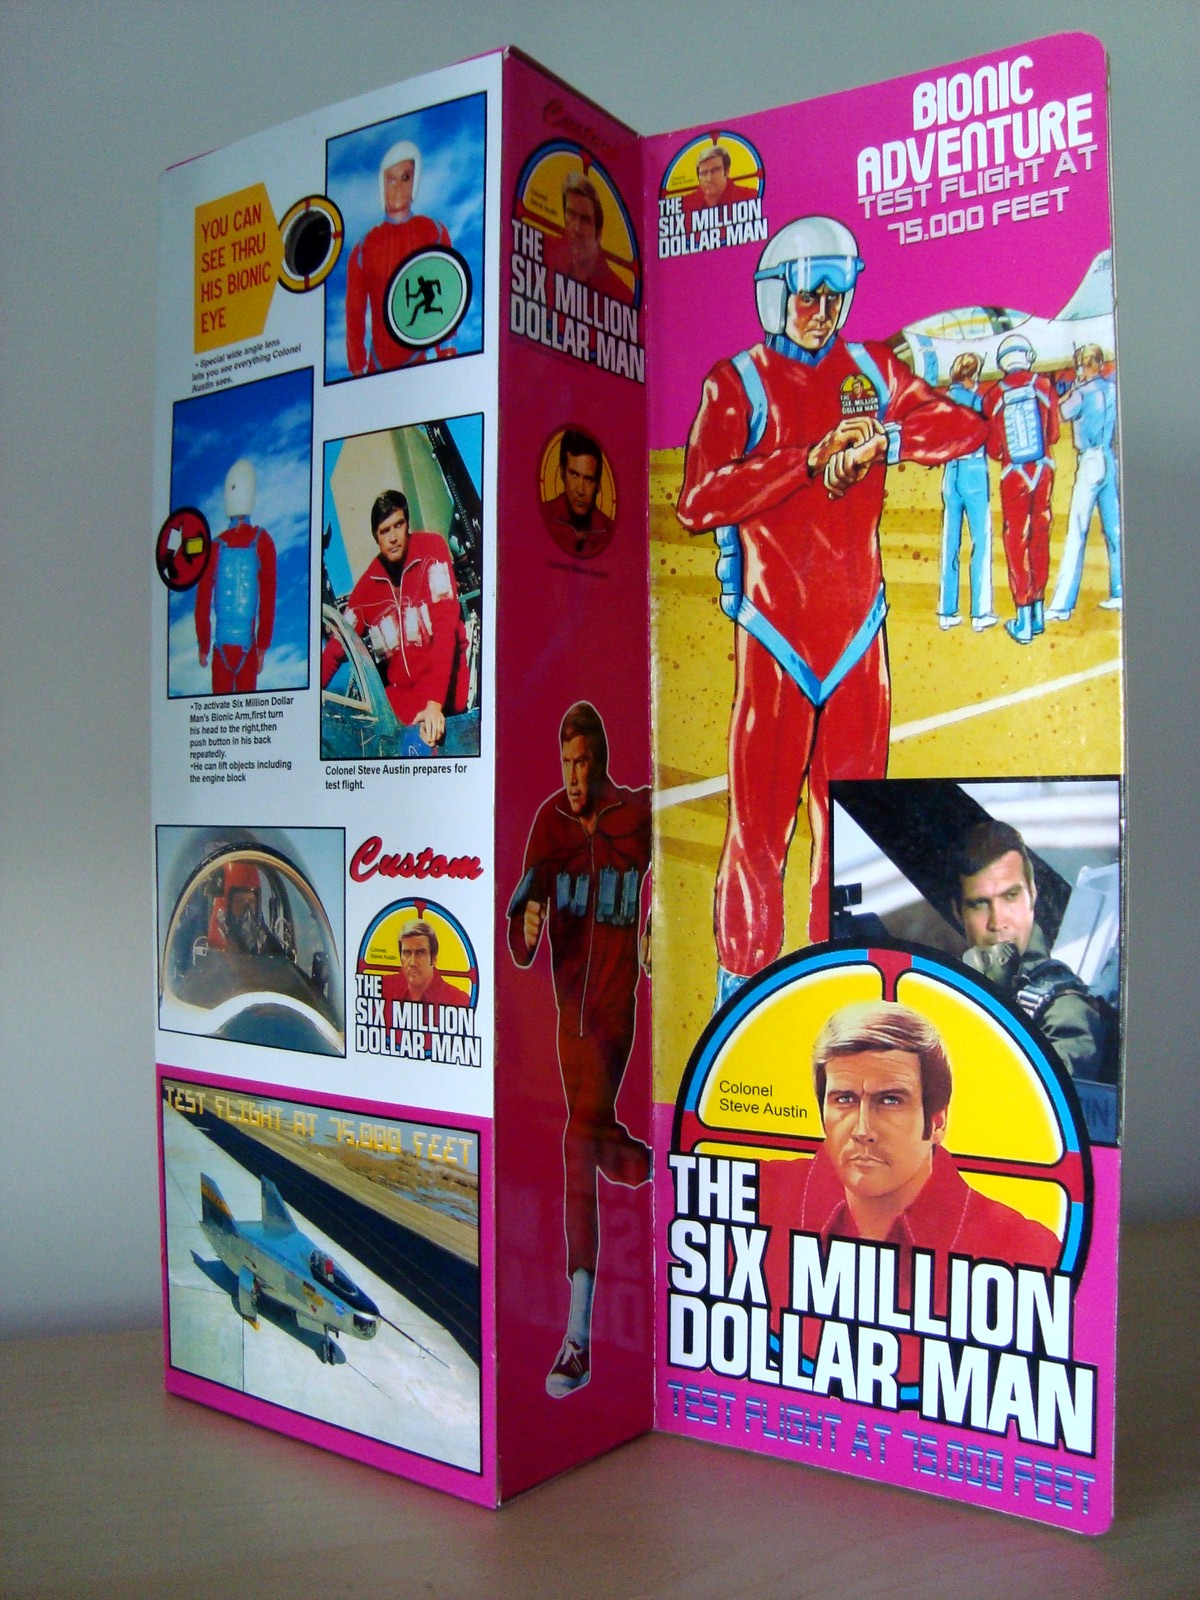 Steve Austin L'homme qui valait 3 milliards - KENNER MECCANO - Page 11 170707071737563415